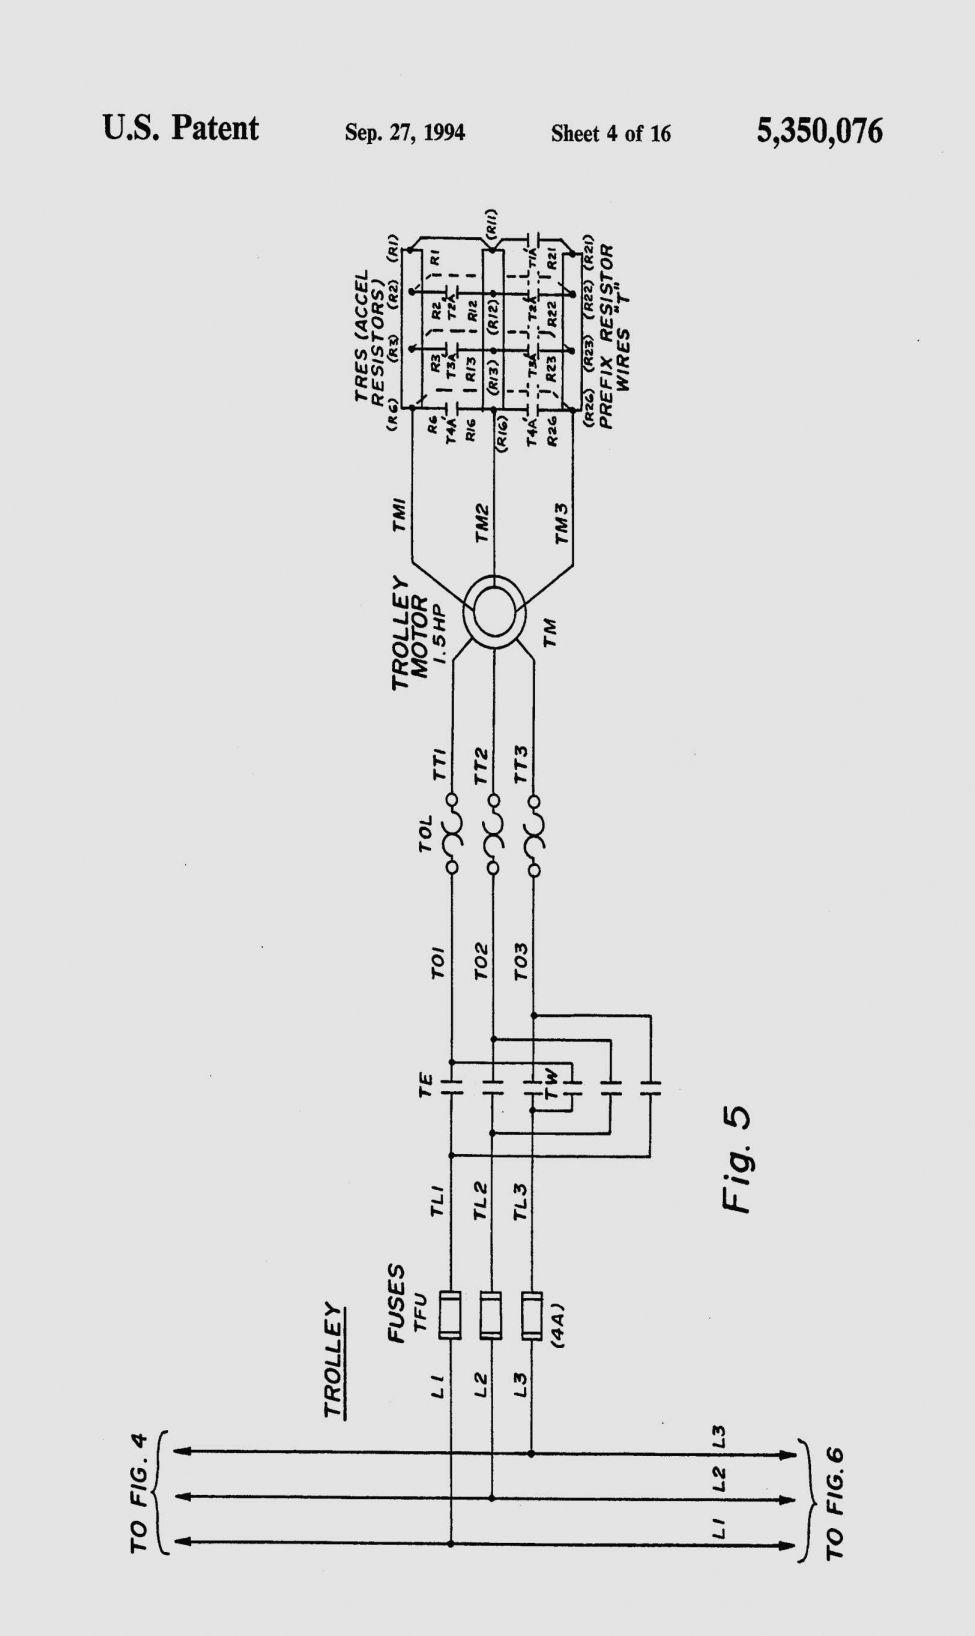 [DIAGRAM] Coffing Electric Chain Hoist Wiring Diagram